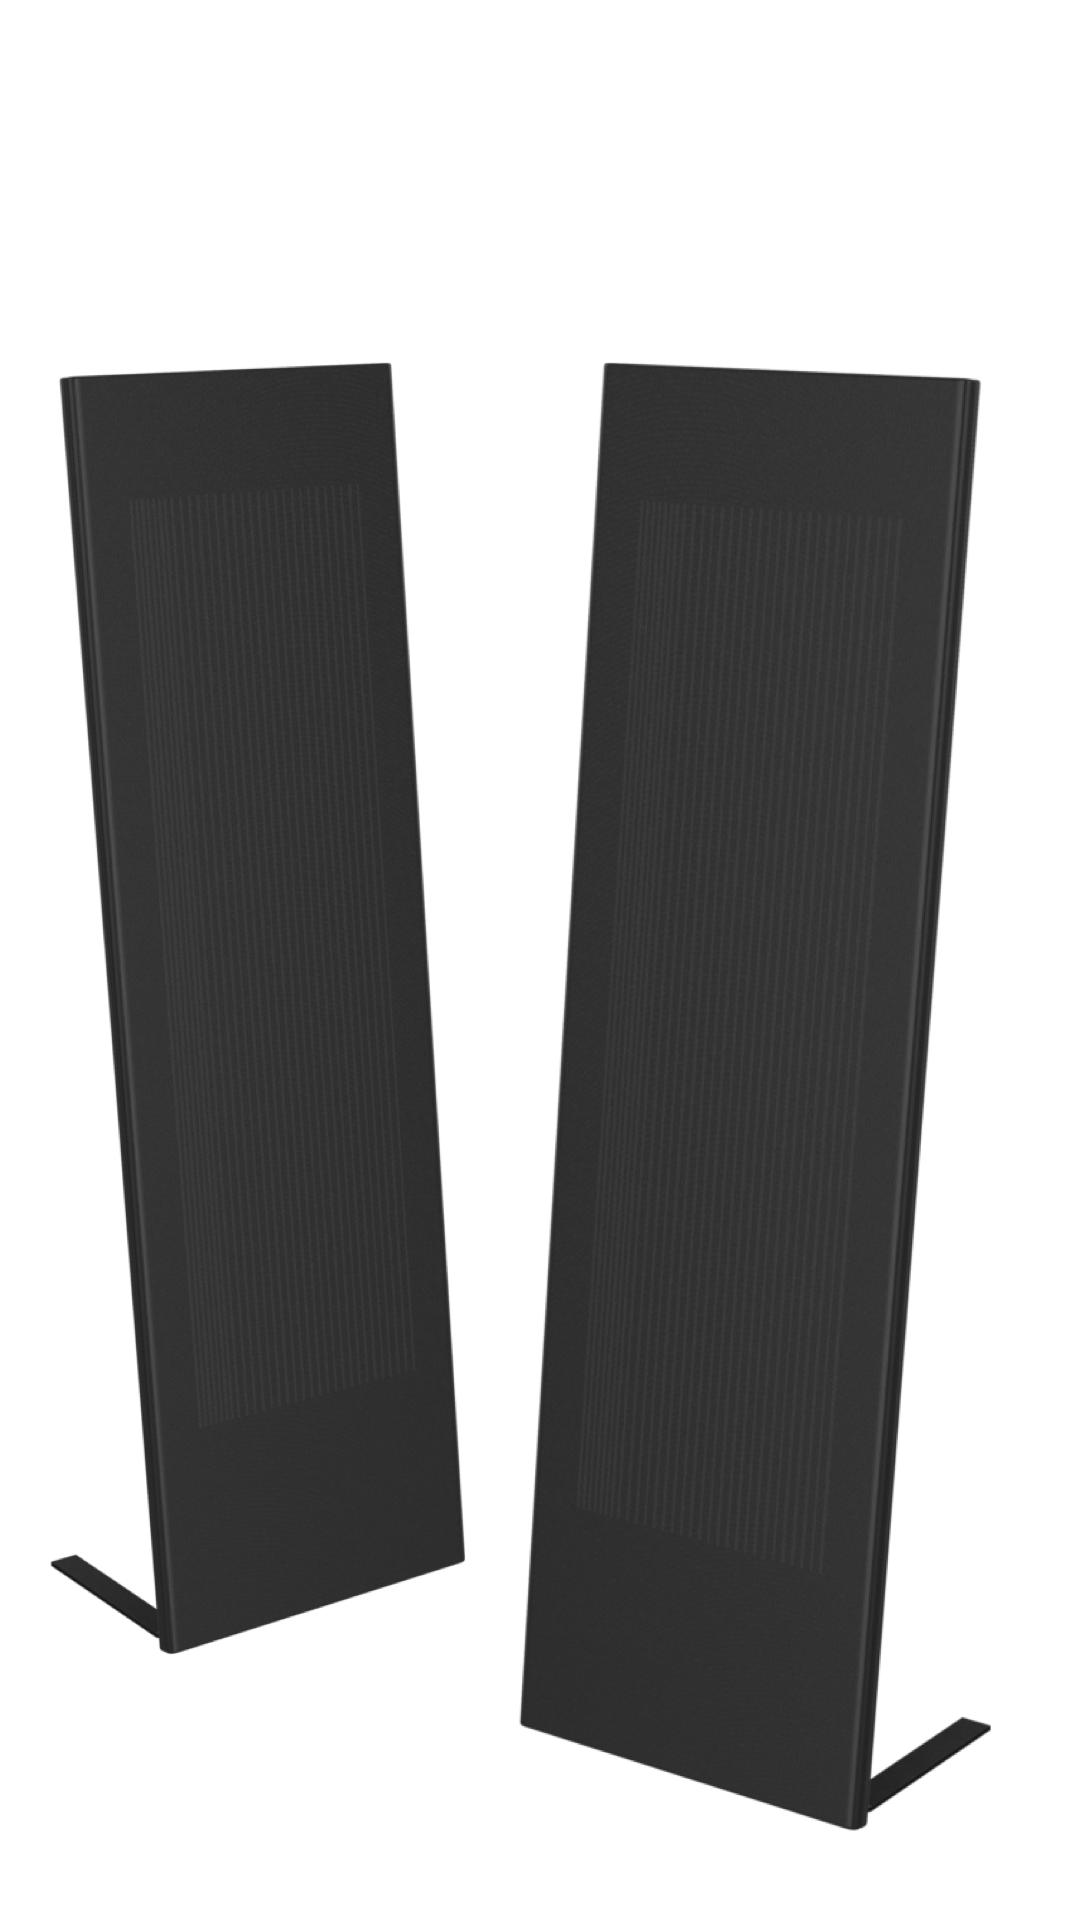 Magnepan LRS black